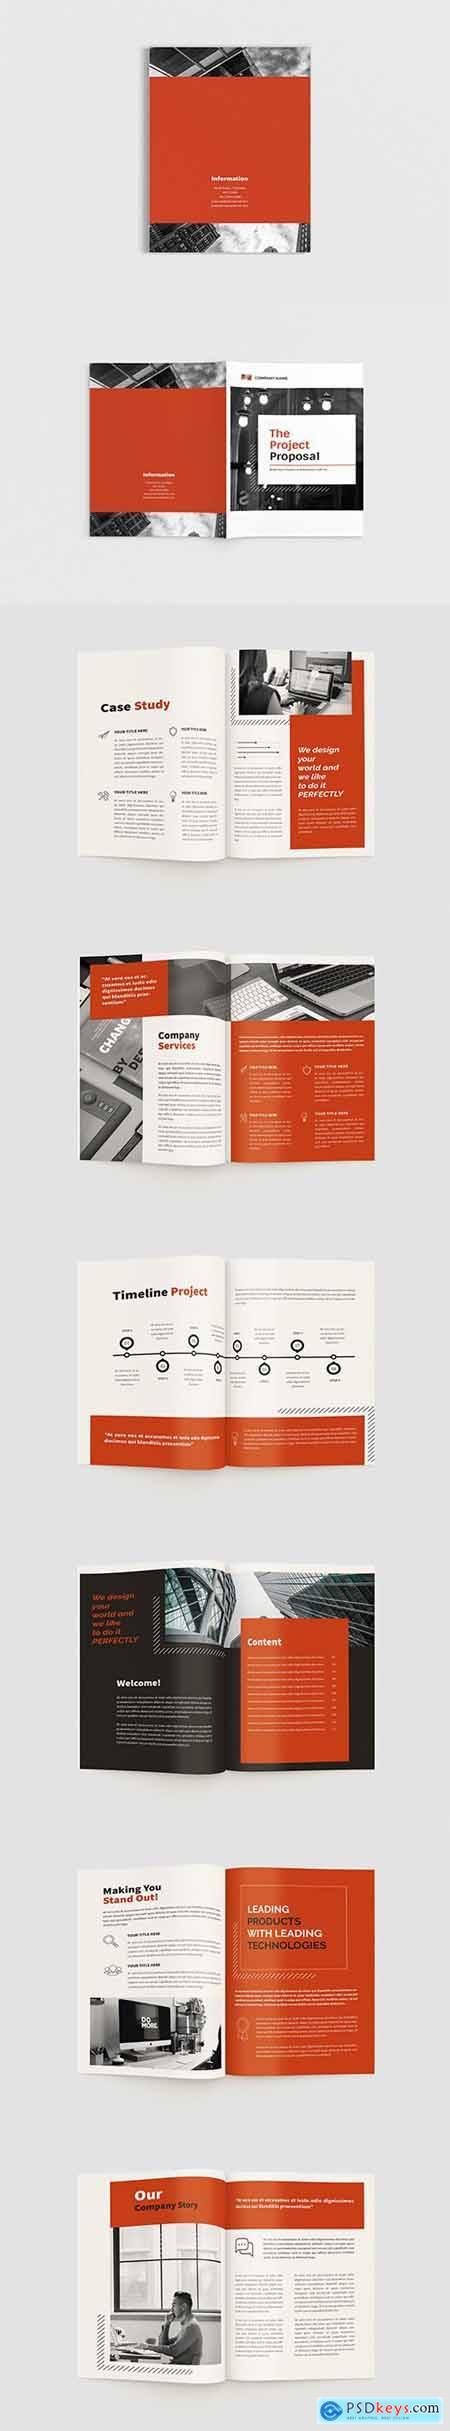 The Project Company Profile